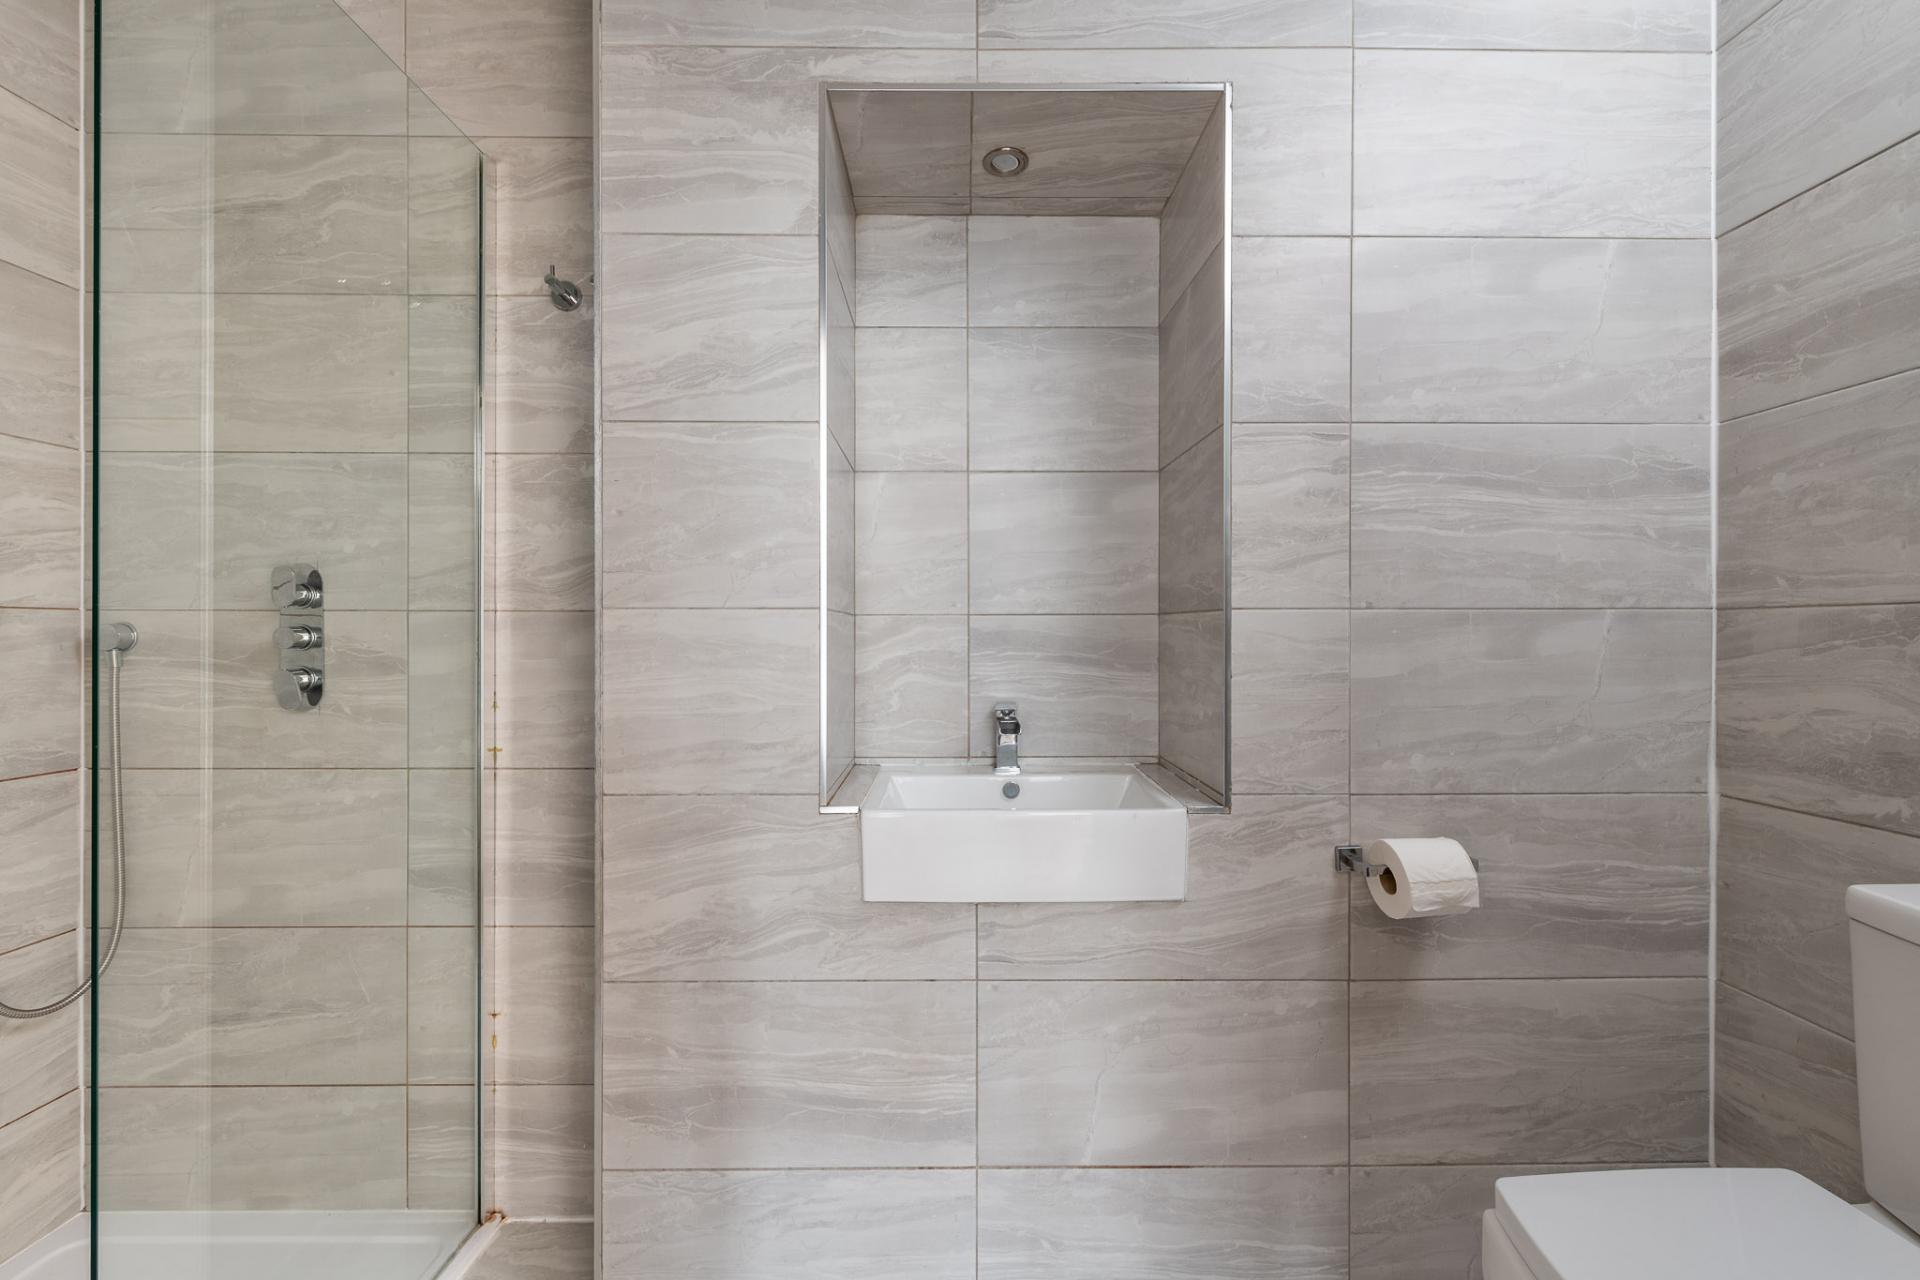 Bathroom at Edgbaston Apartments, Rotton Park, Birmingham - Citybase Apartments